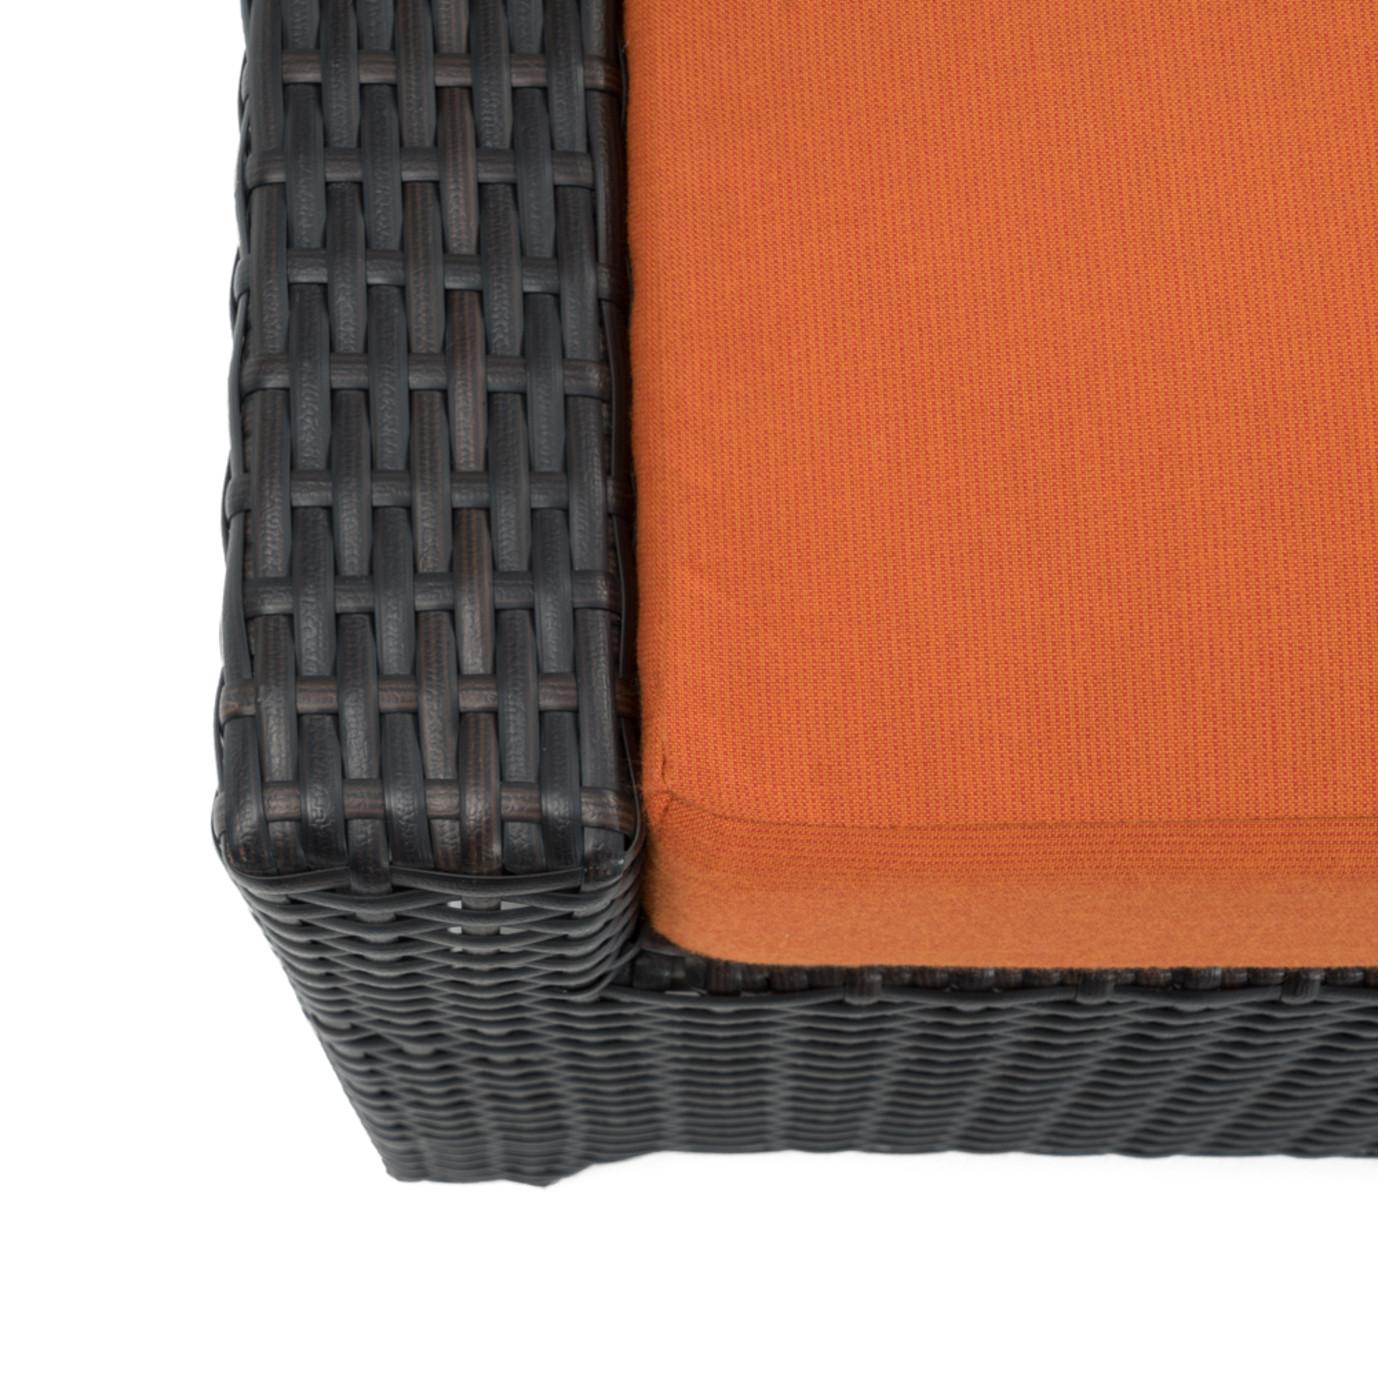 Deco Deluxe 6 Piece Love & Motion Club Seating Set - Tikka Orange